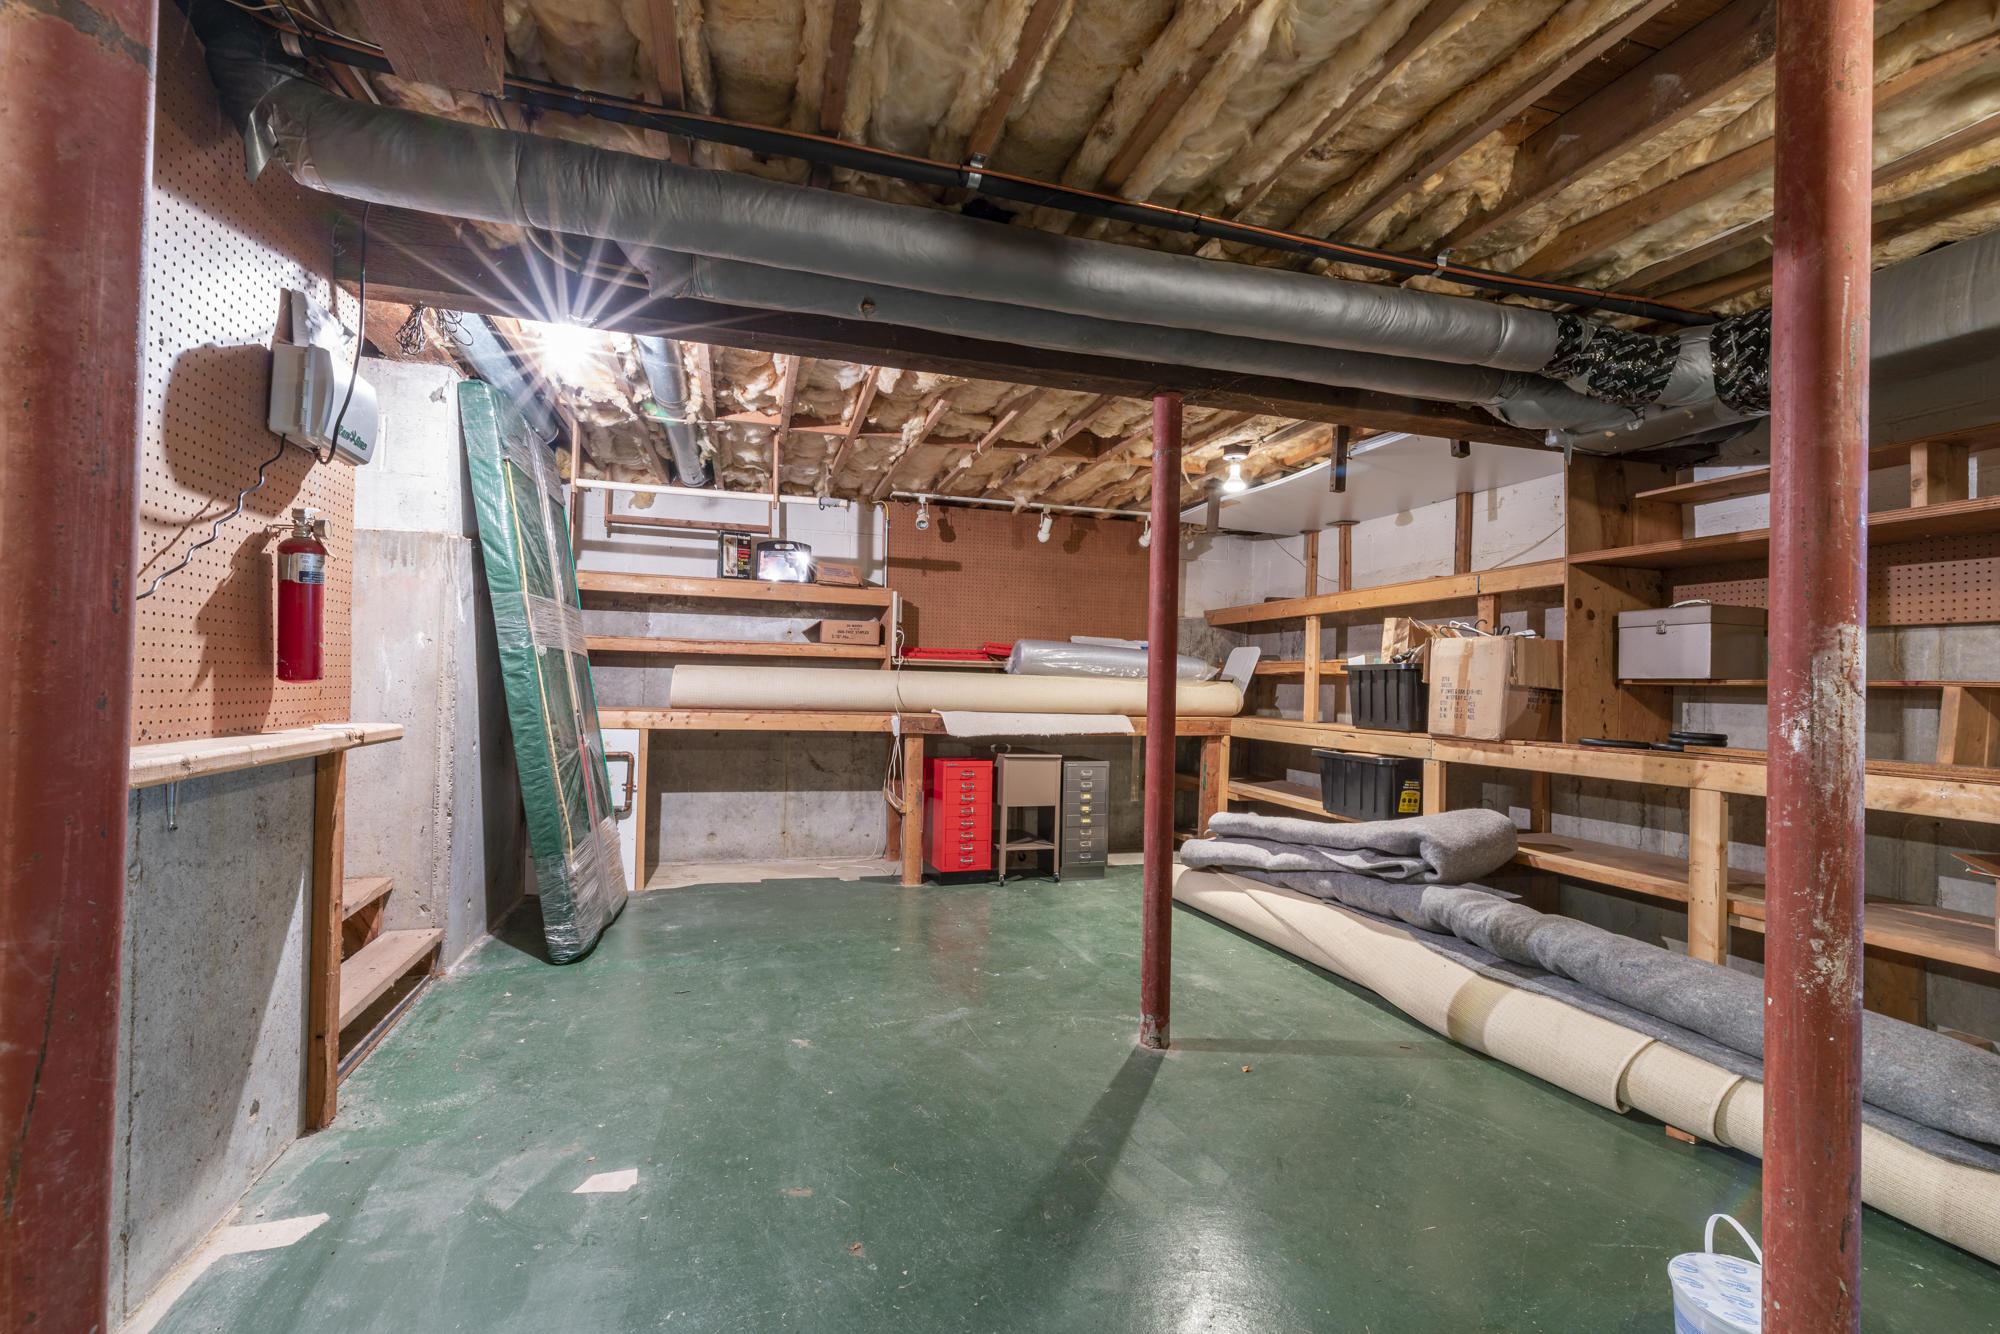 90 Seaview Street, Chatham, MA  02633 - slide 37